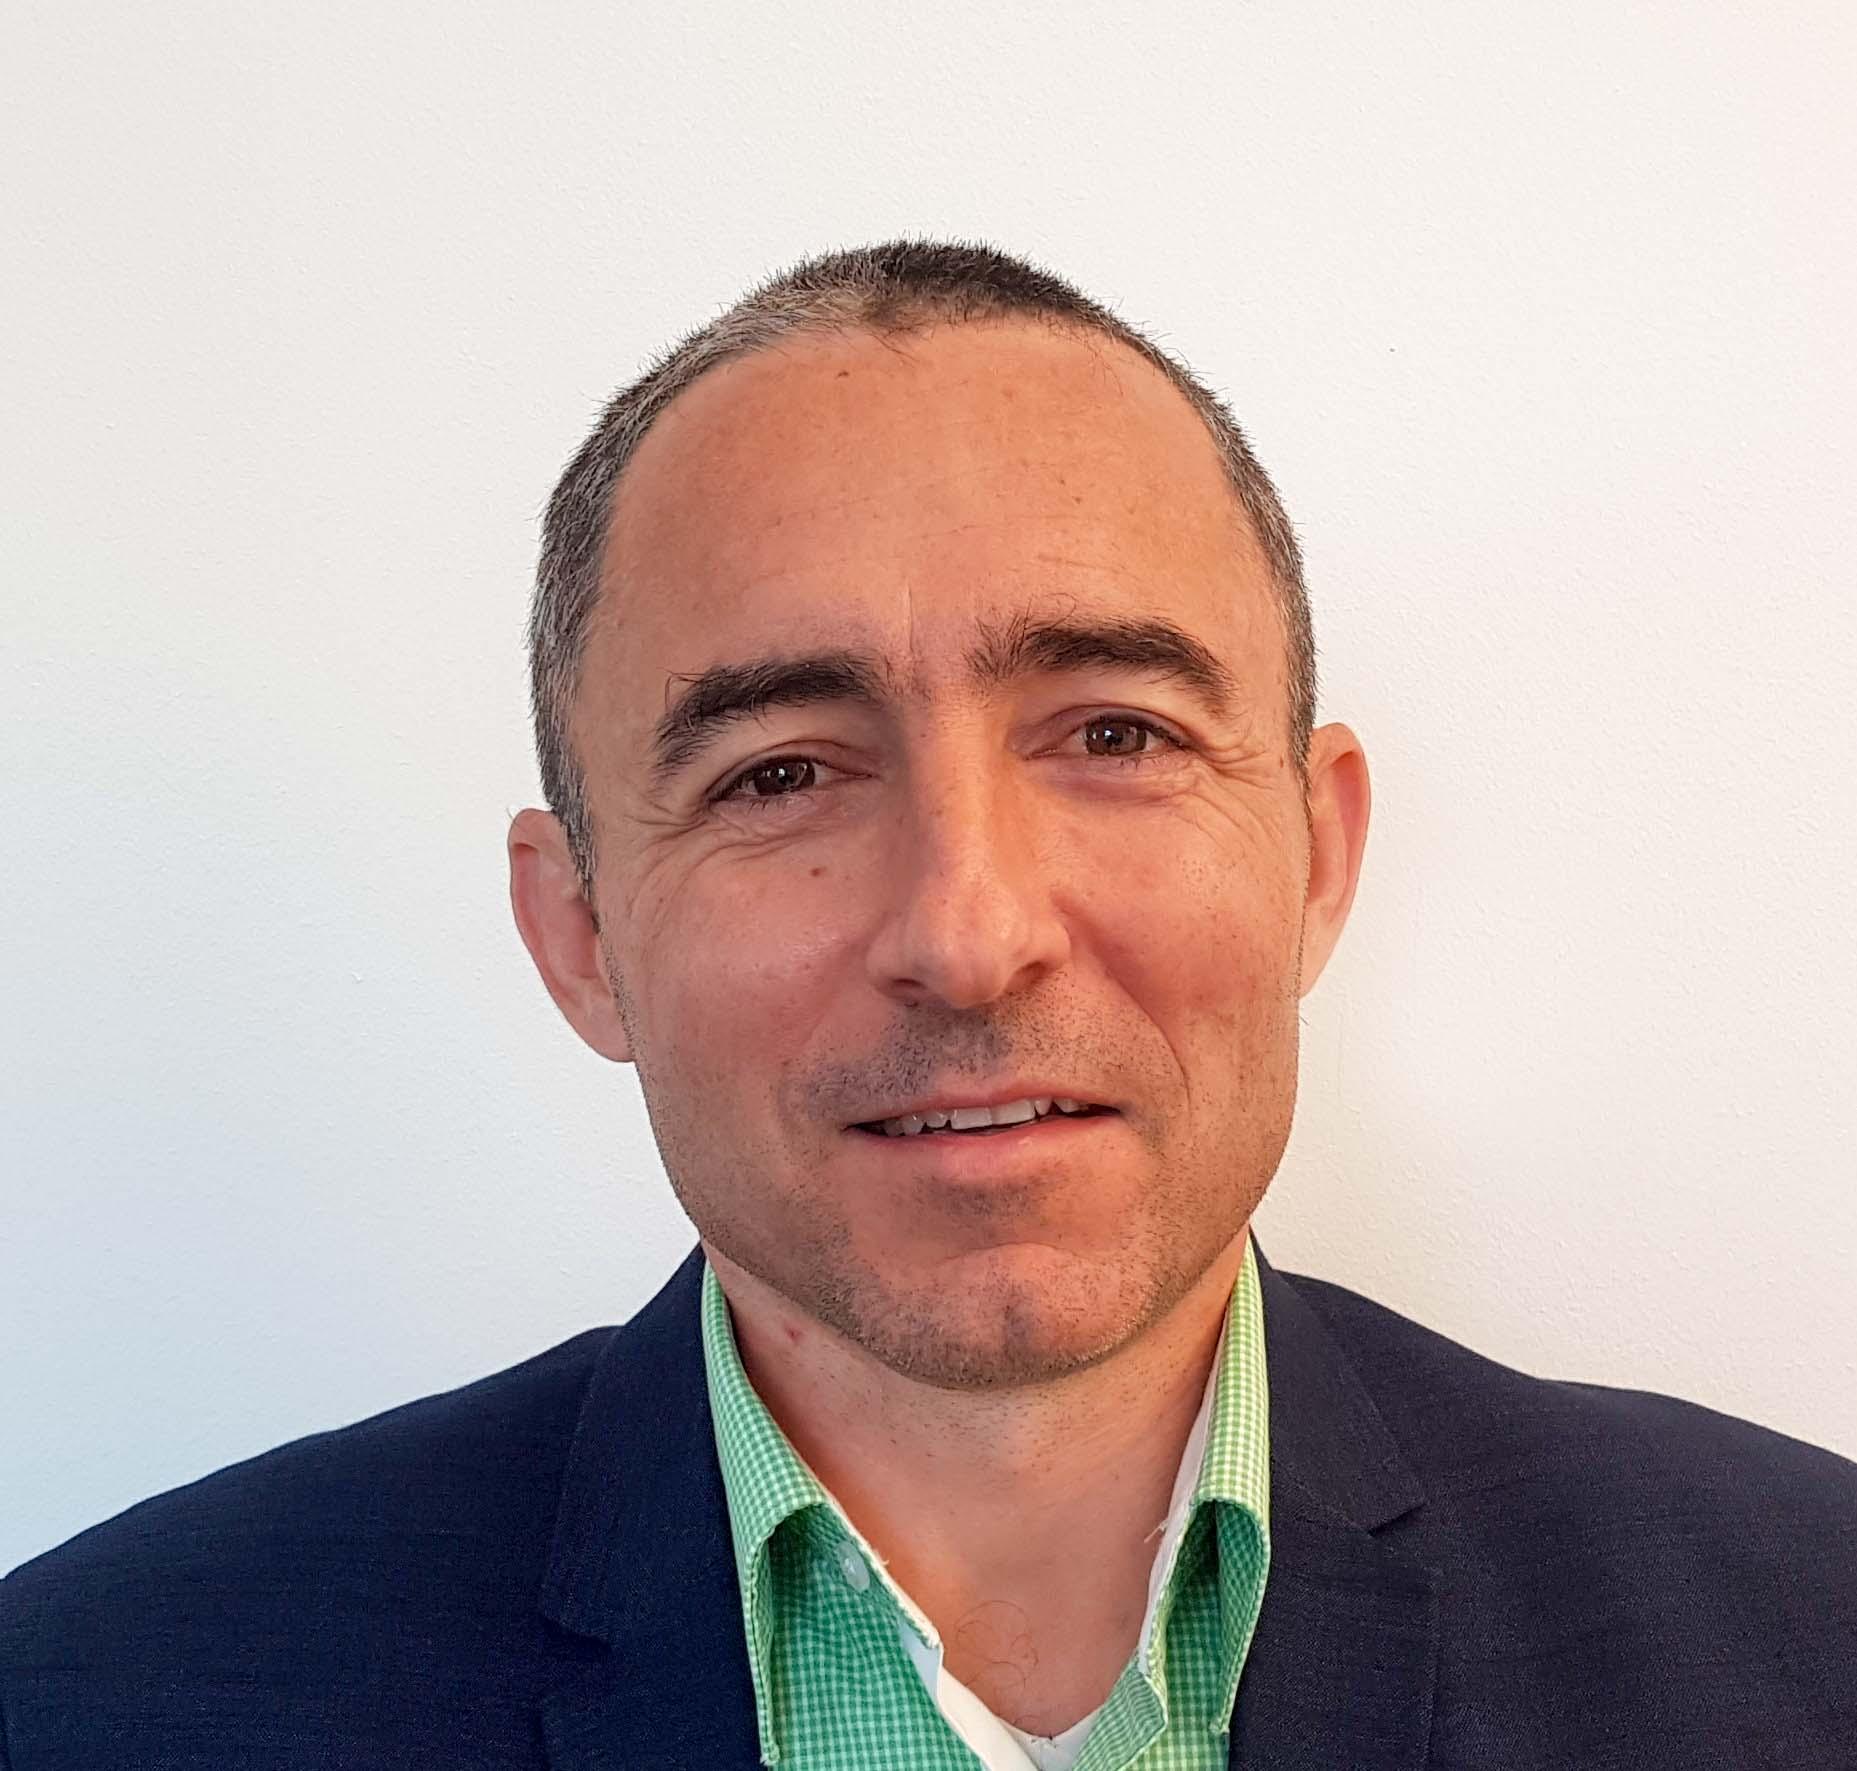 Peter Szentirmay